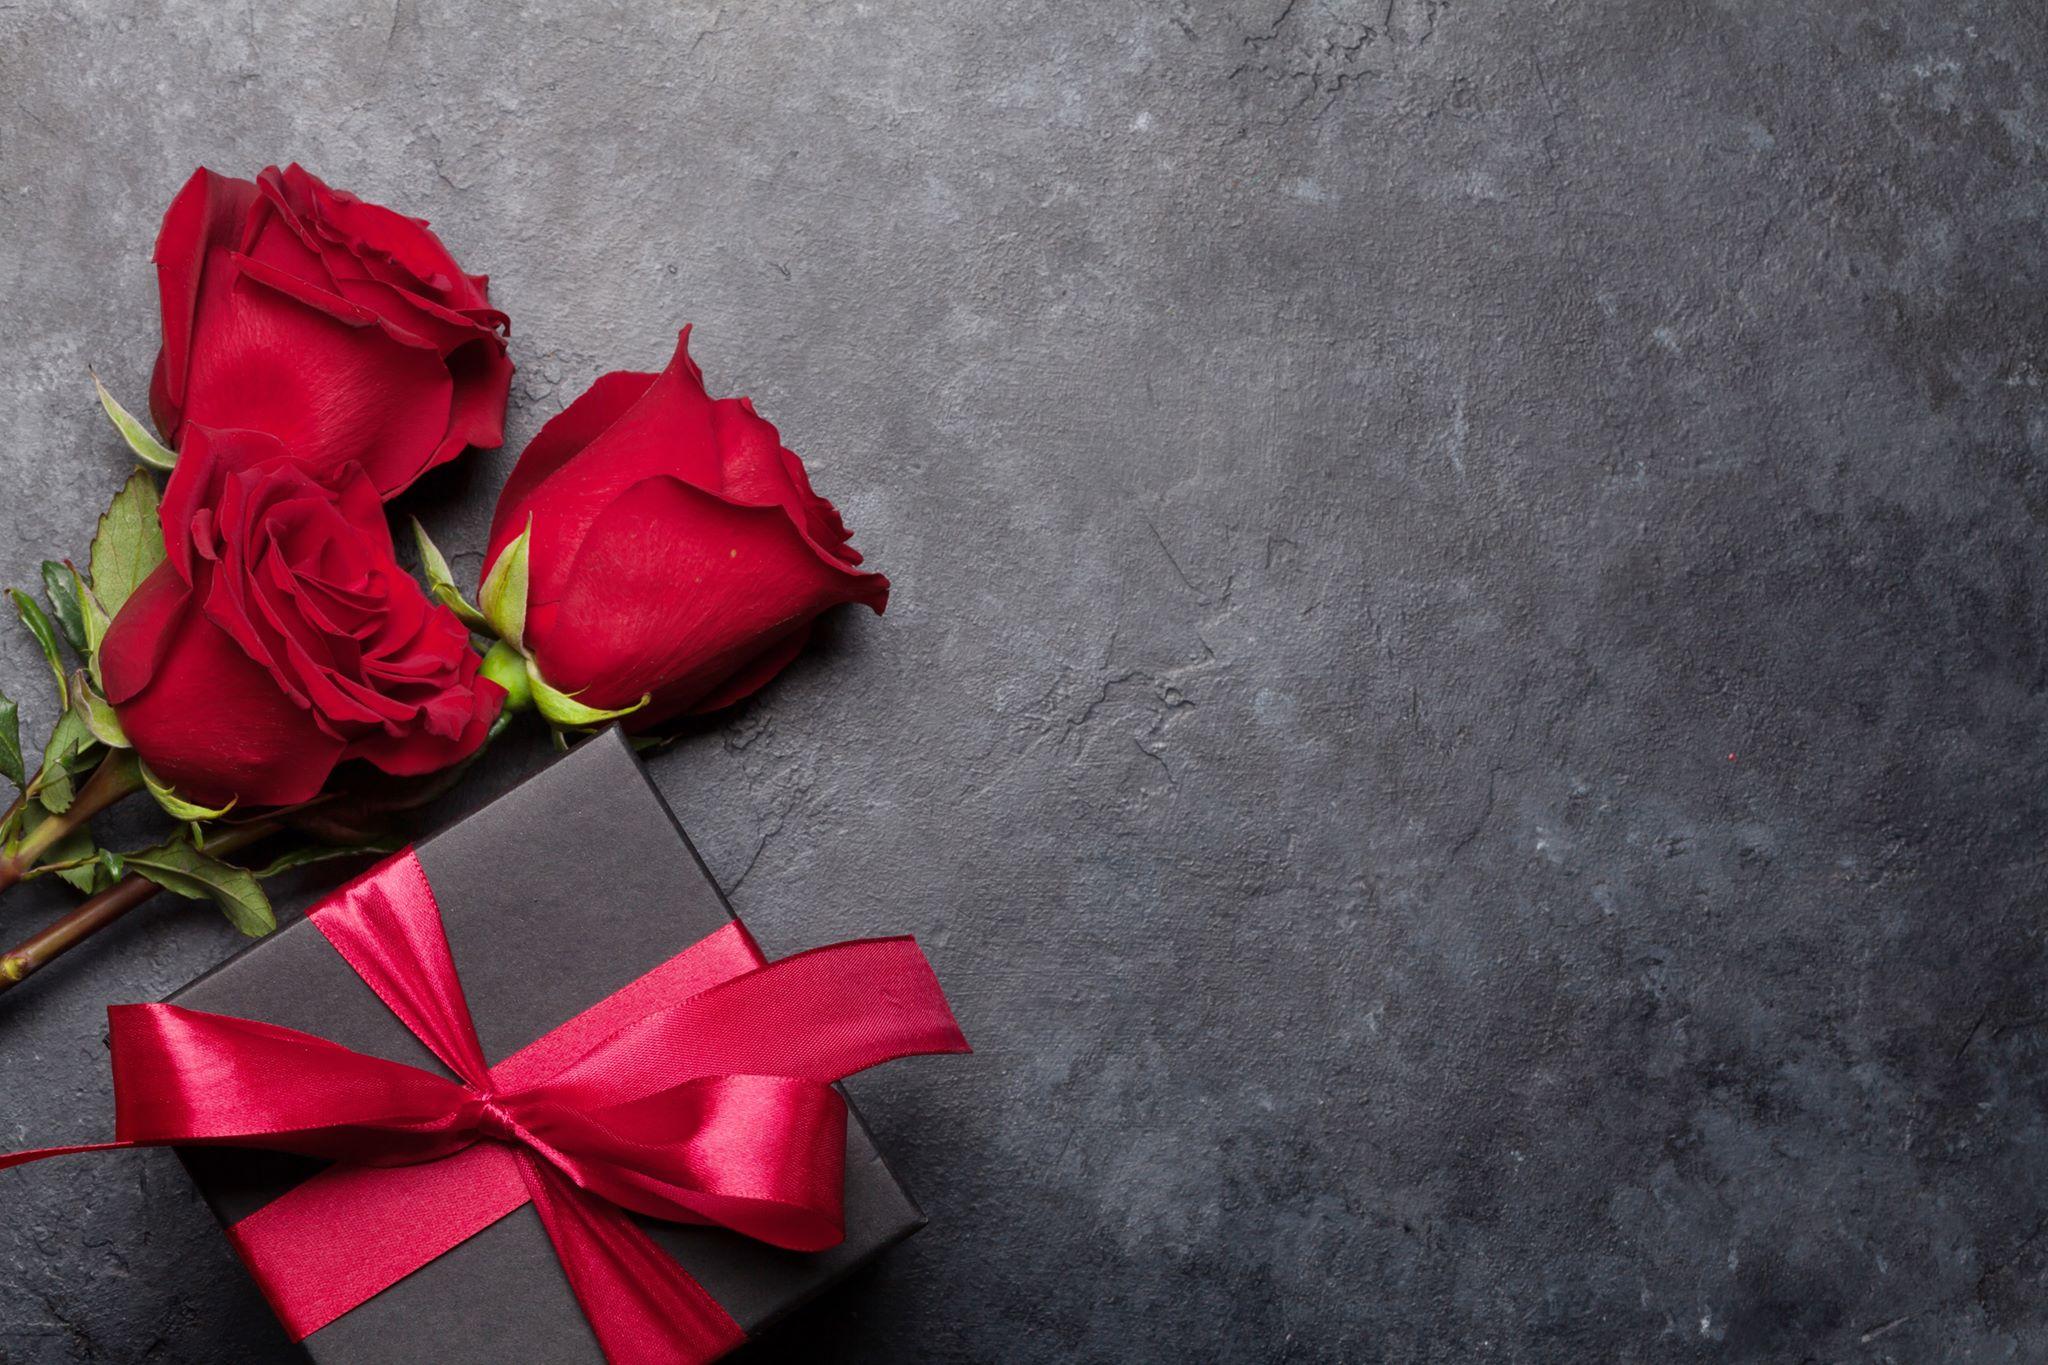 Valentines day images 10 صور عيد الحب